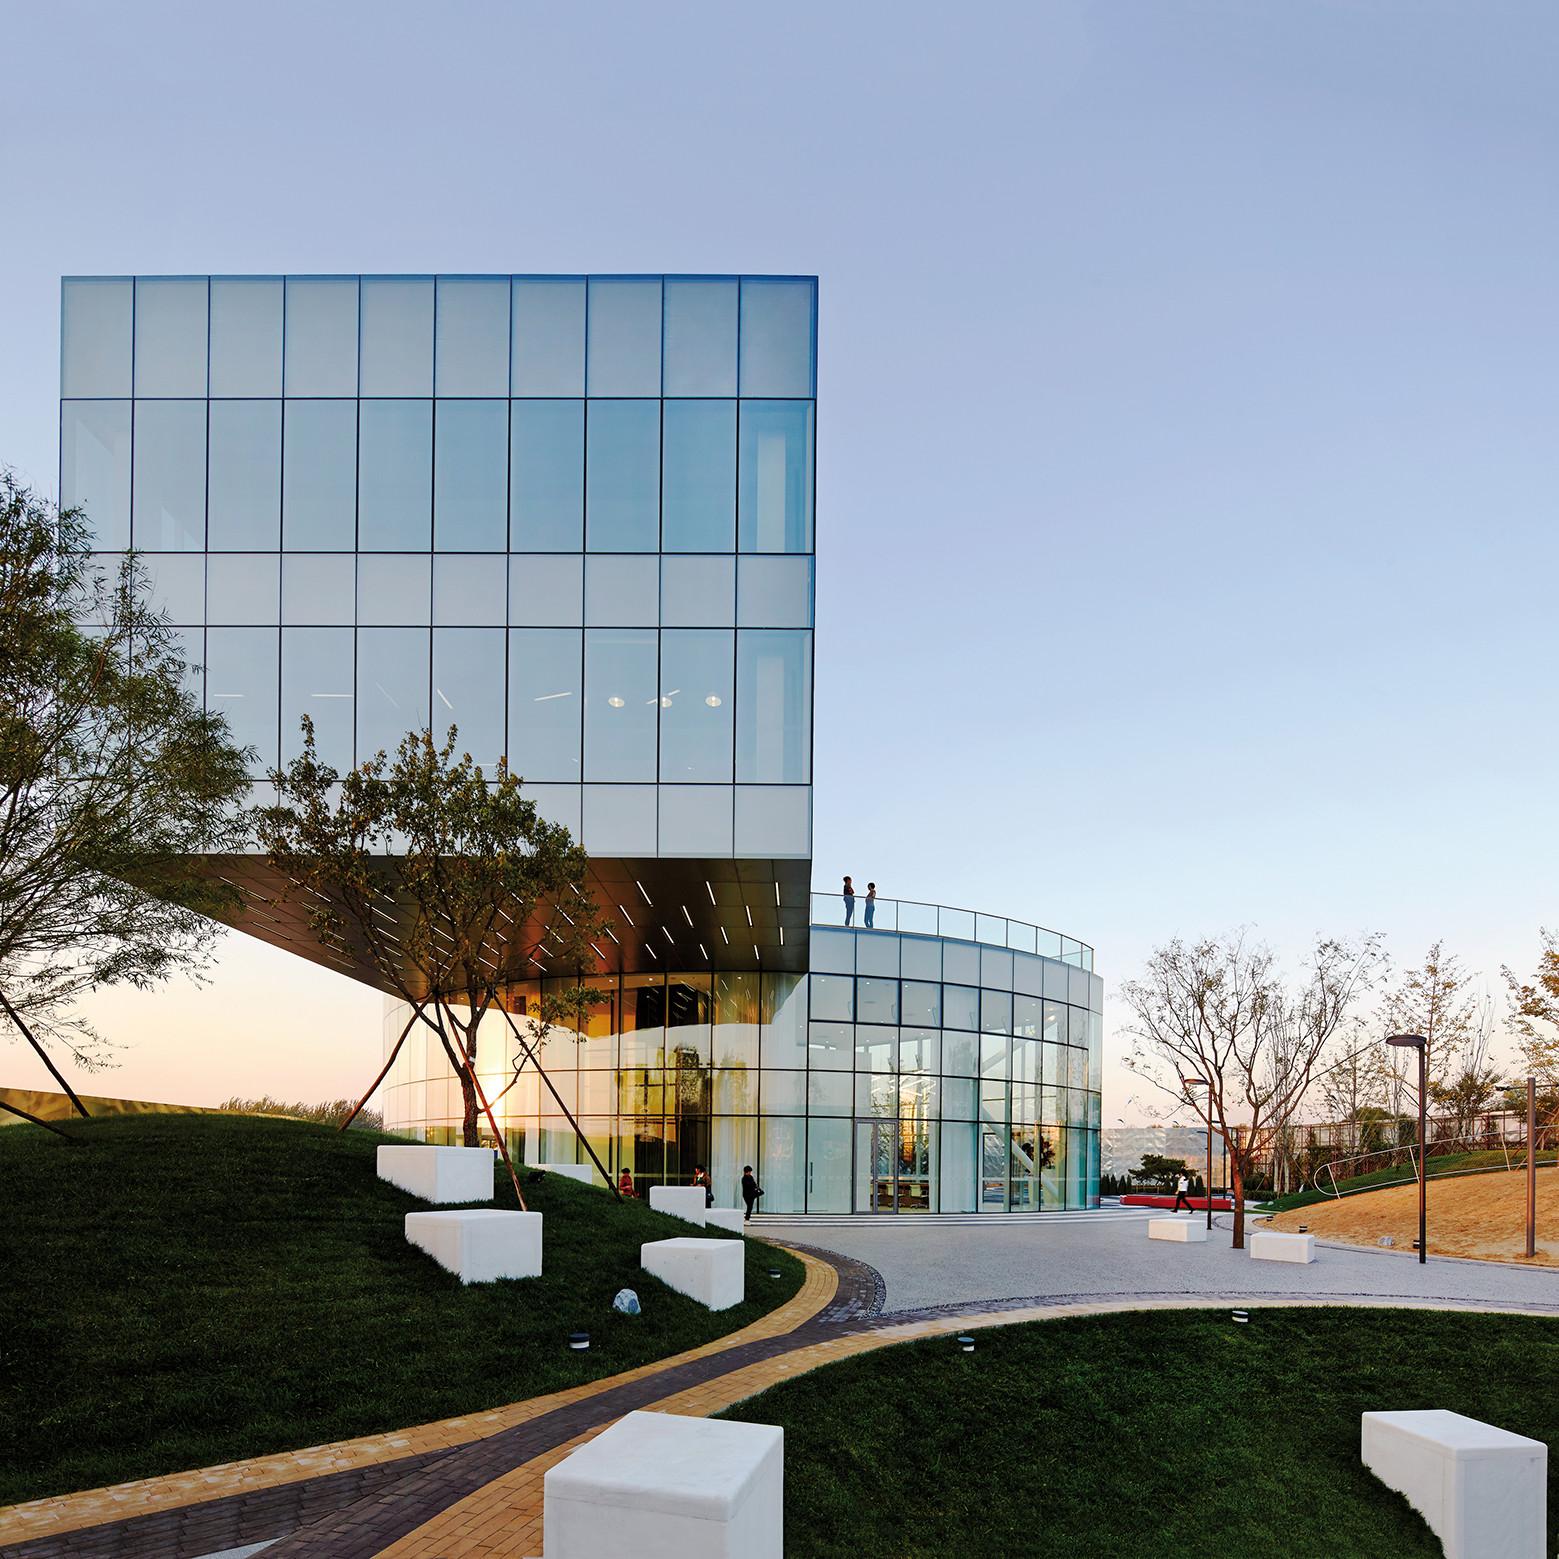 Galería de Ventas Vanke Daxing / Spark Architects, © Shu He